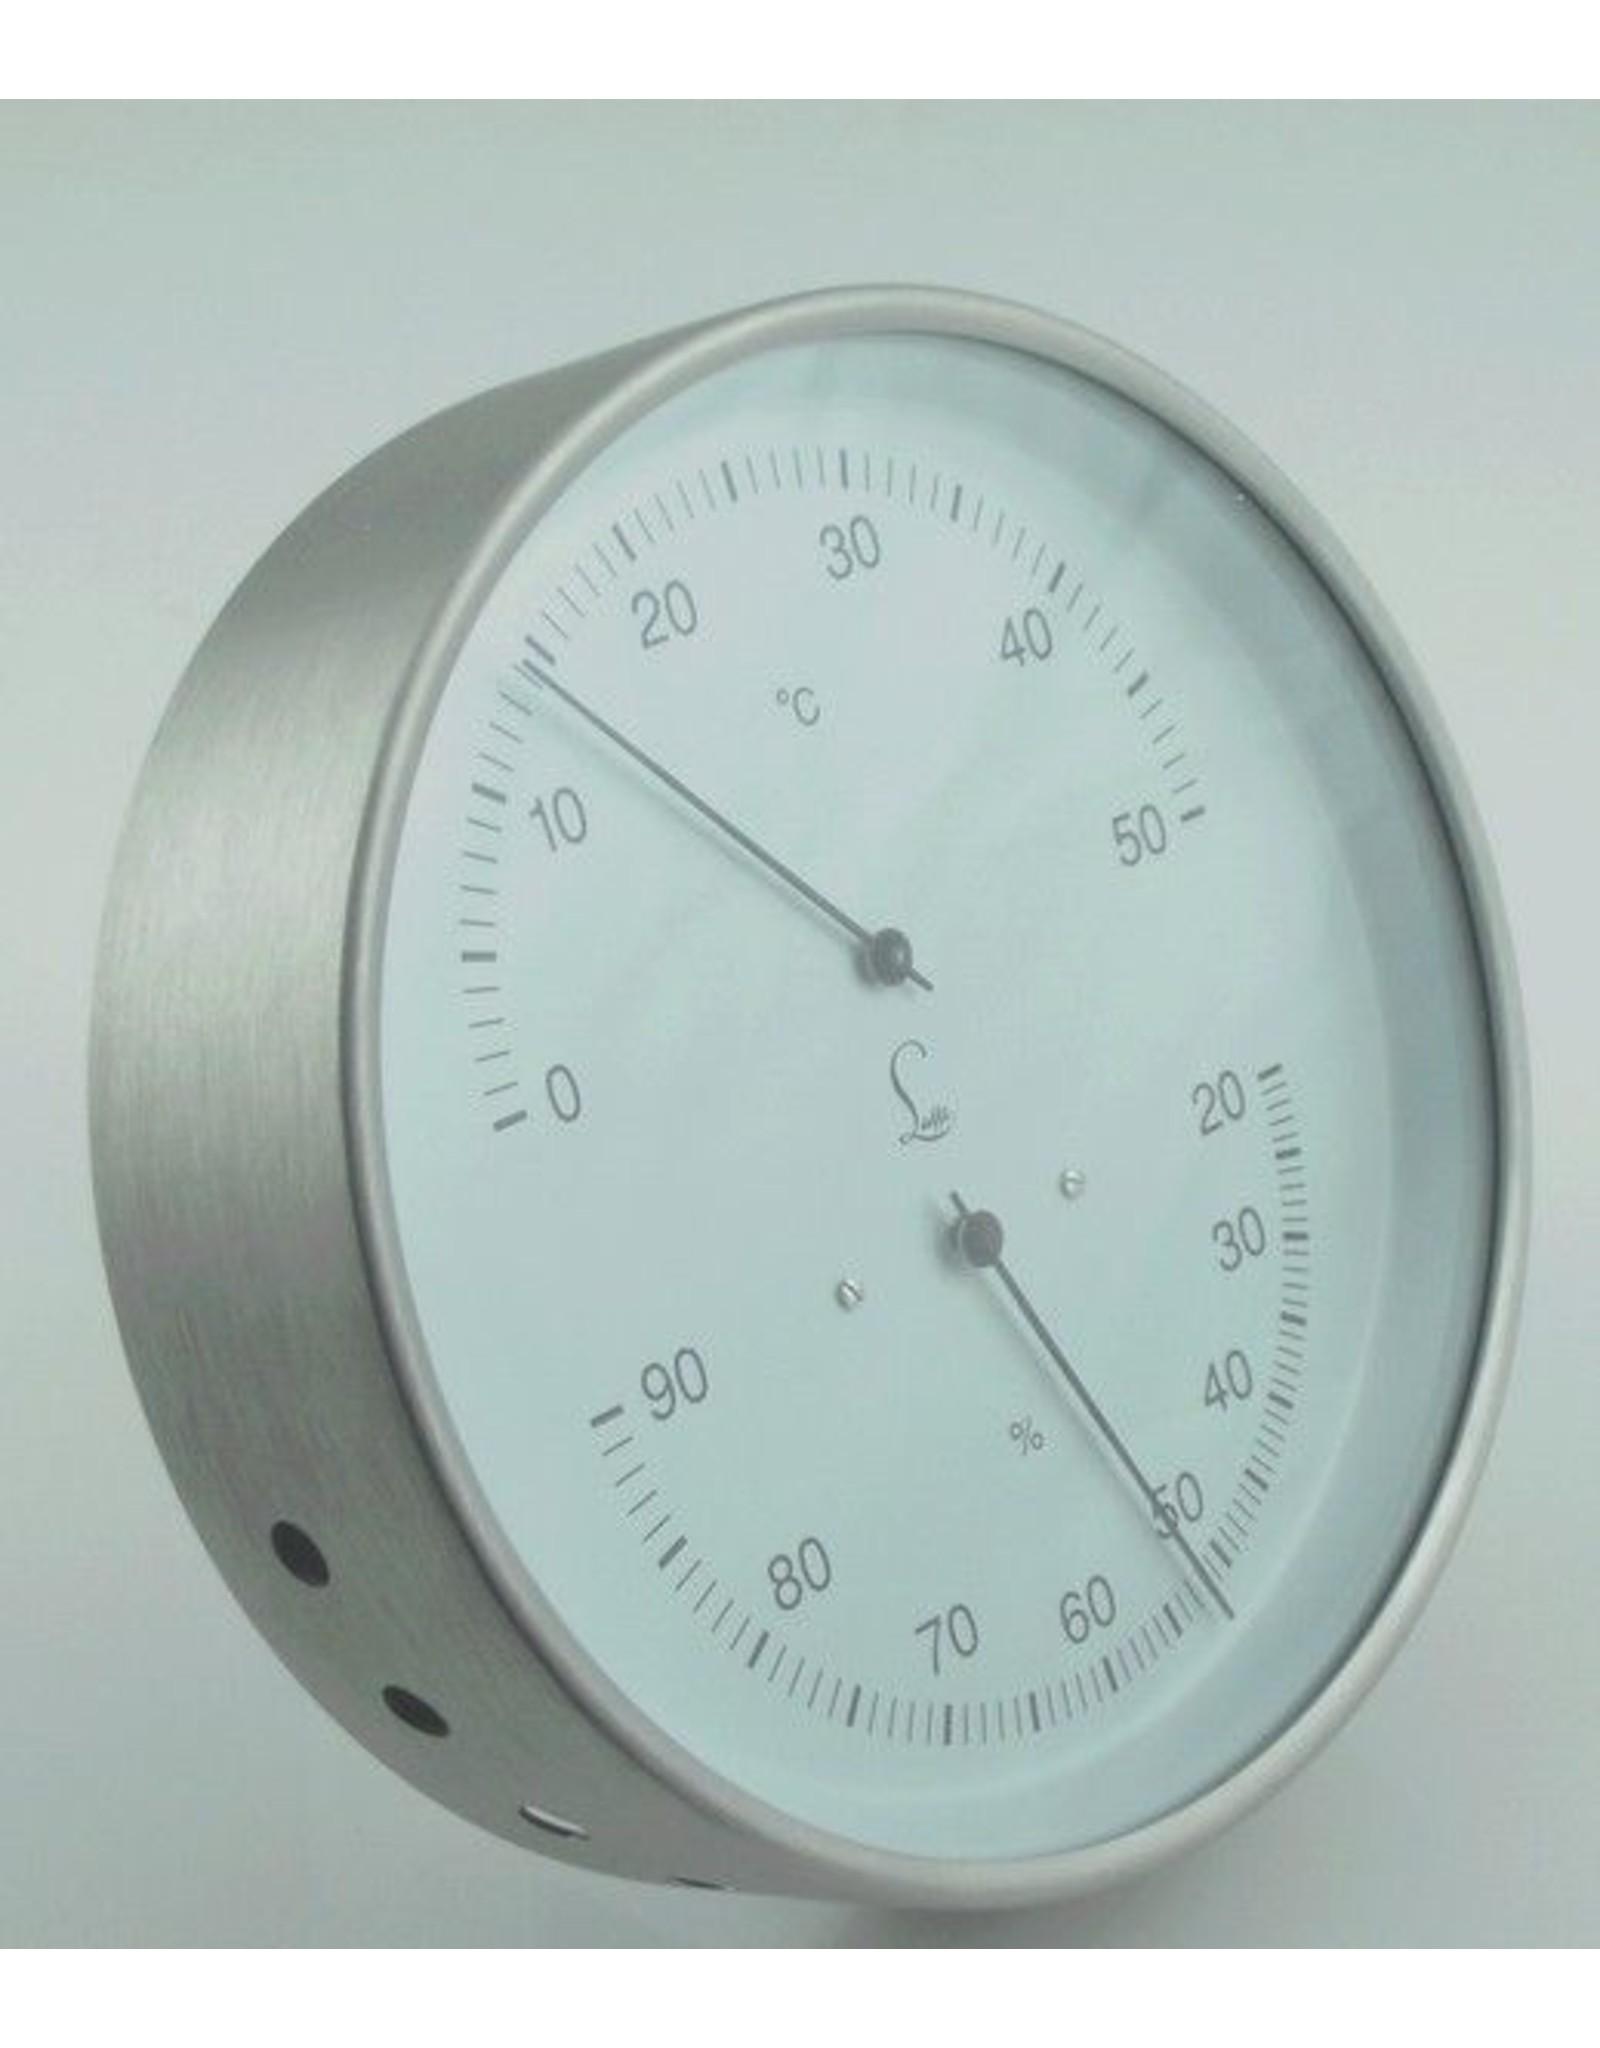 Lufft 002 Hygrometer en thermometer, roestvrij stalen behuizing